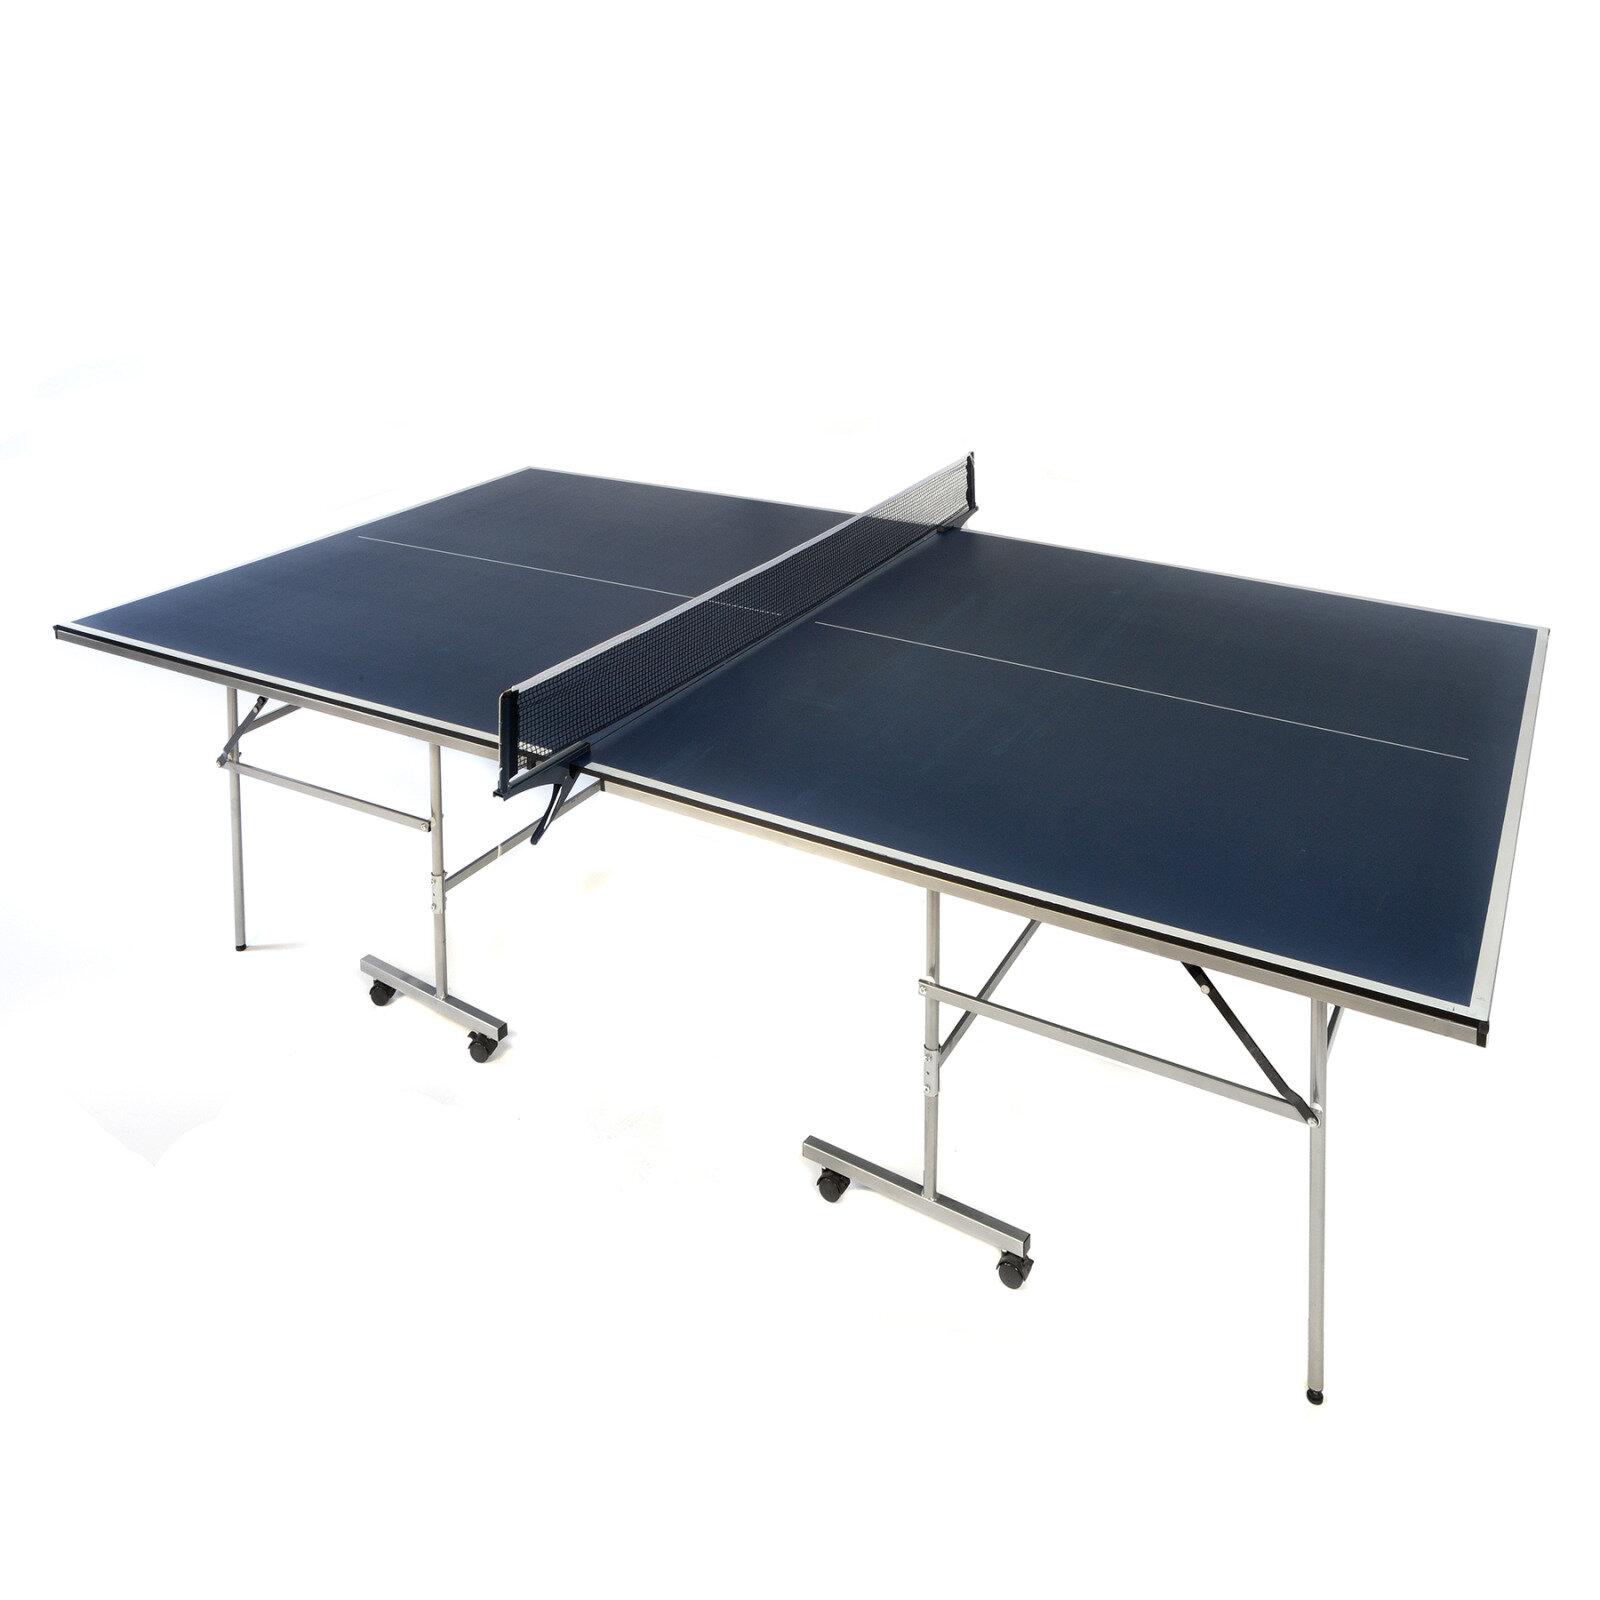 Wildon Home Comet Regulation Size Foldable Indoor Table Tennis Table Wayfair